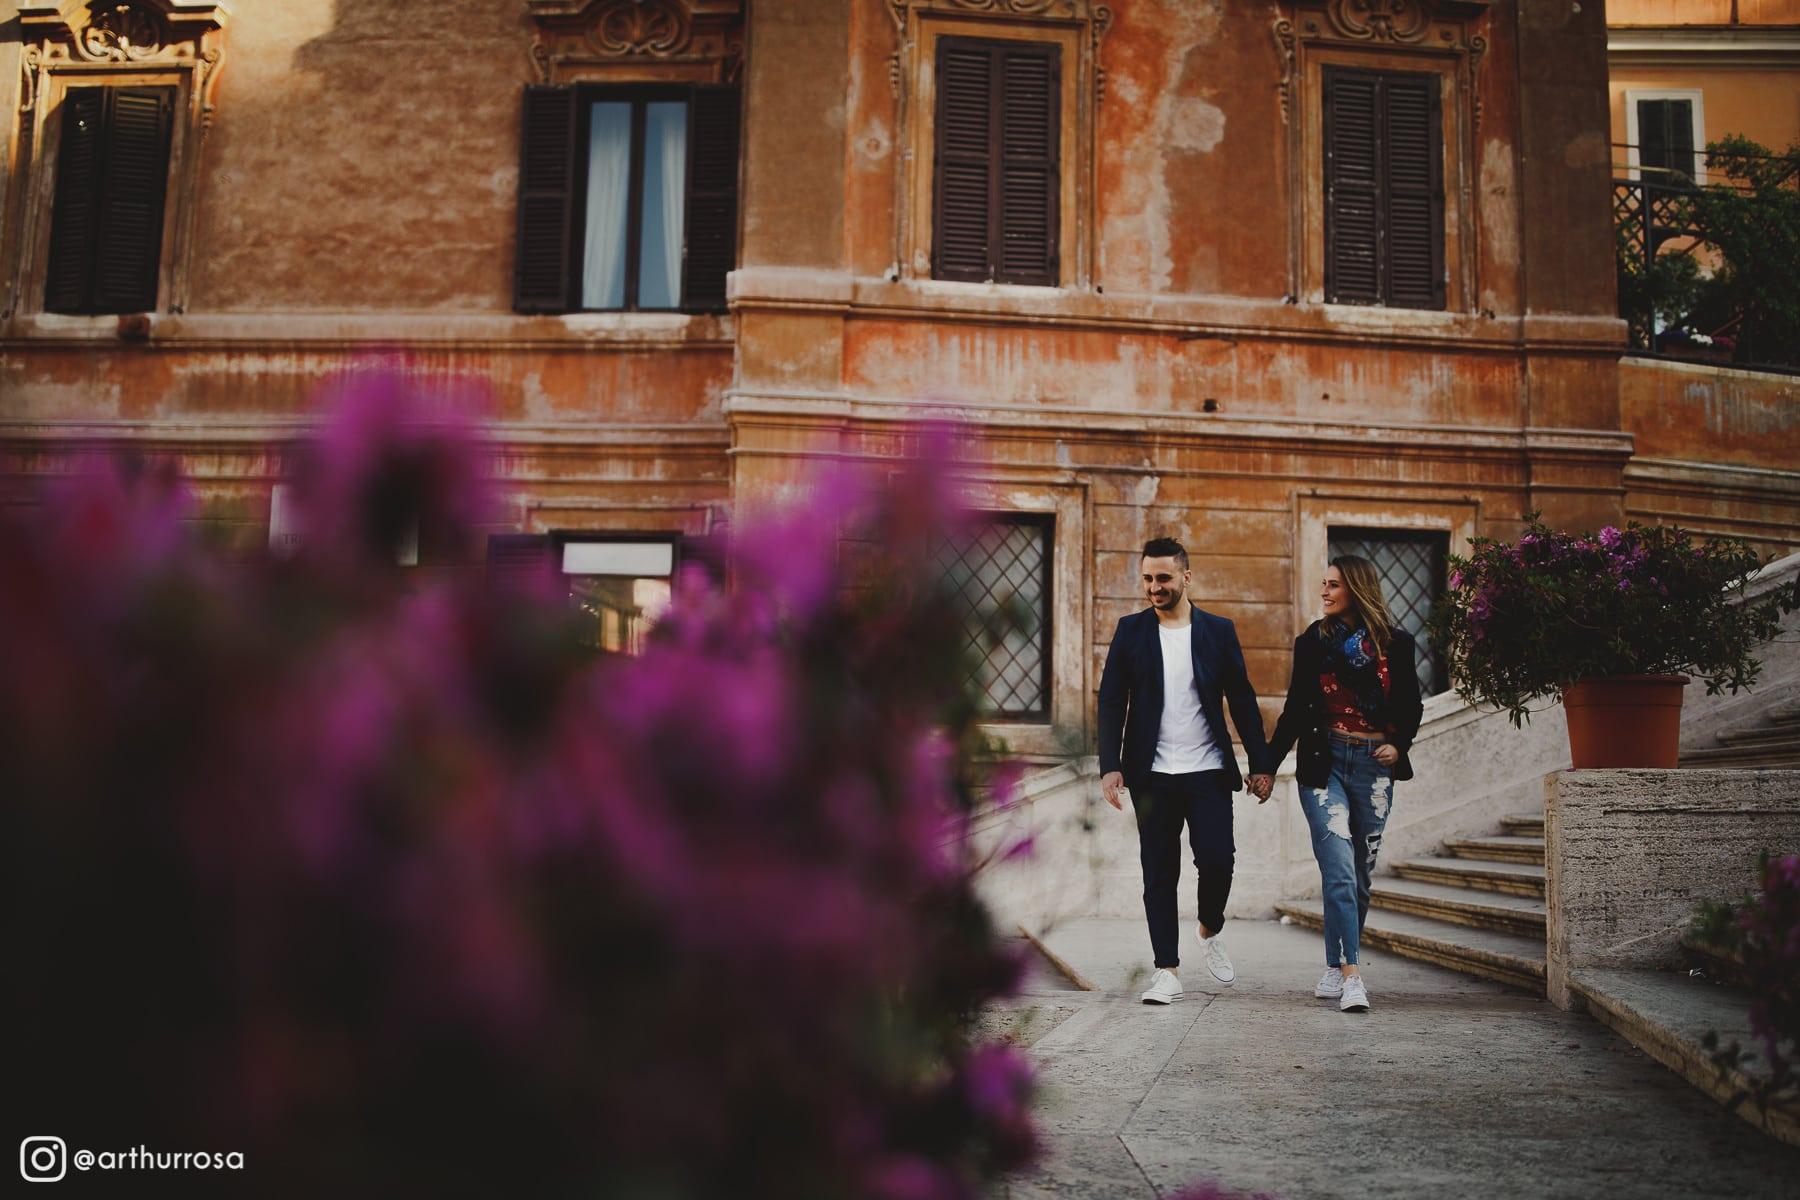 fotógrafo brasileiro em Roma